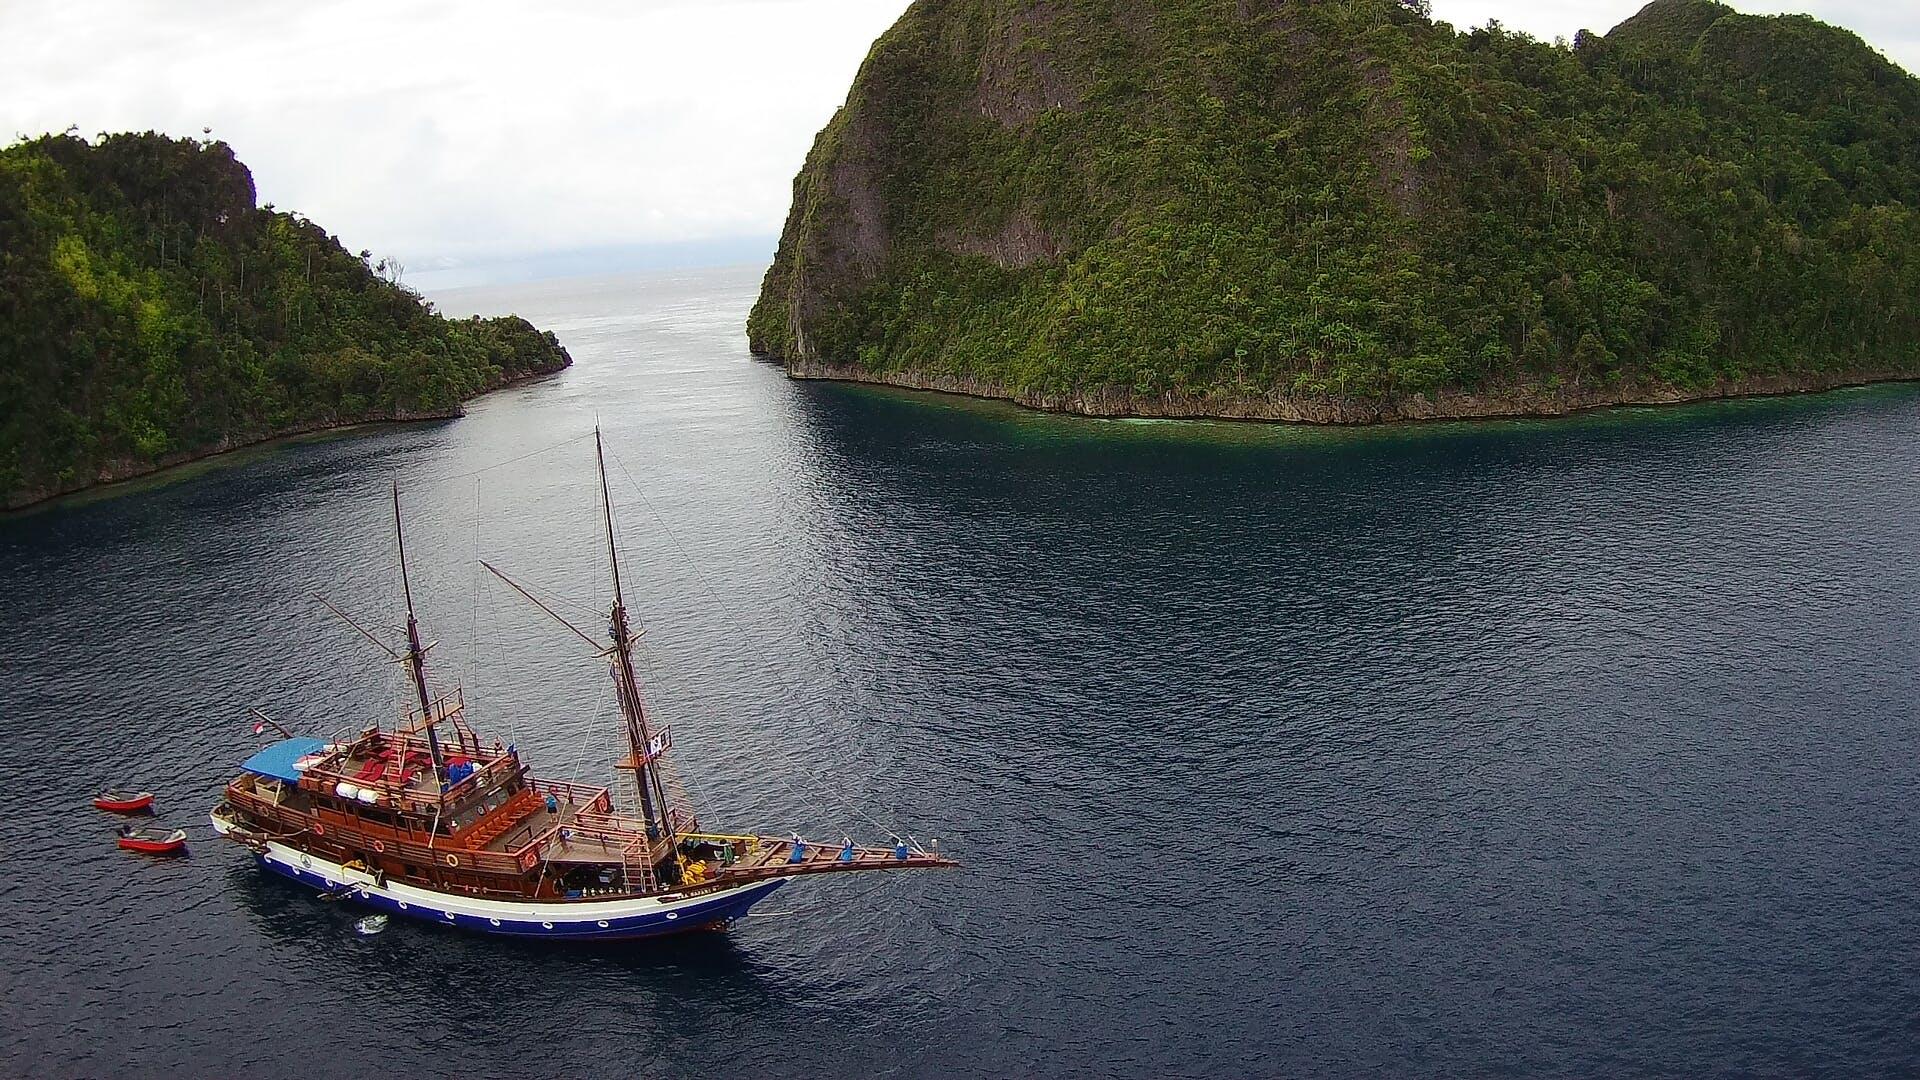 drónkamera, festői, hajó